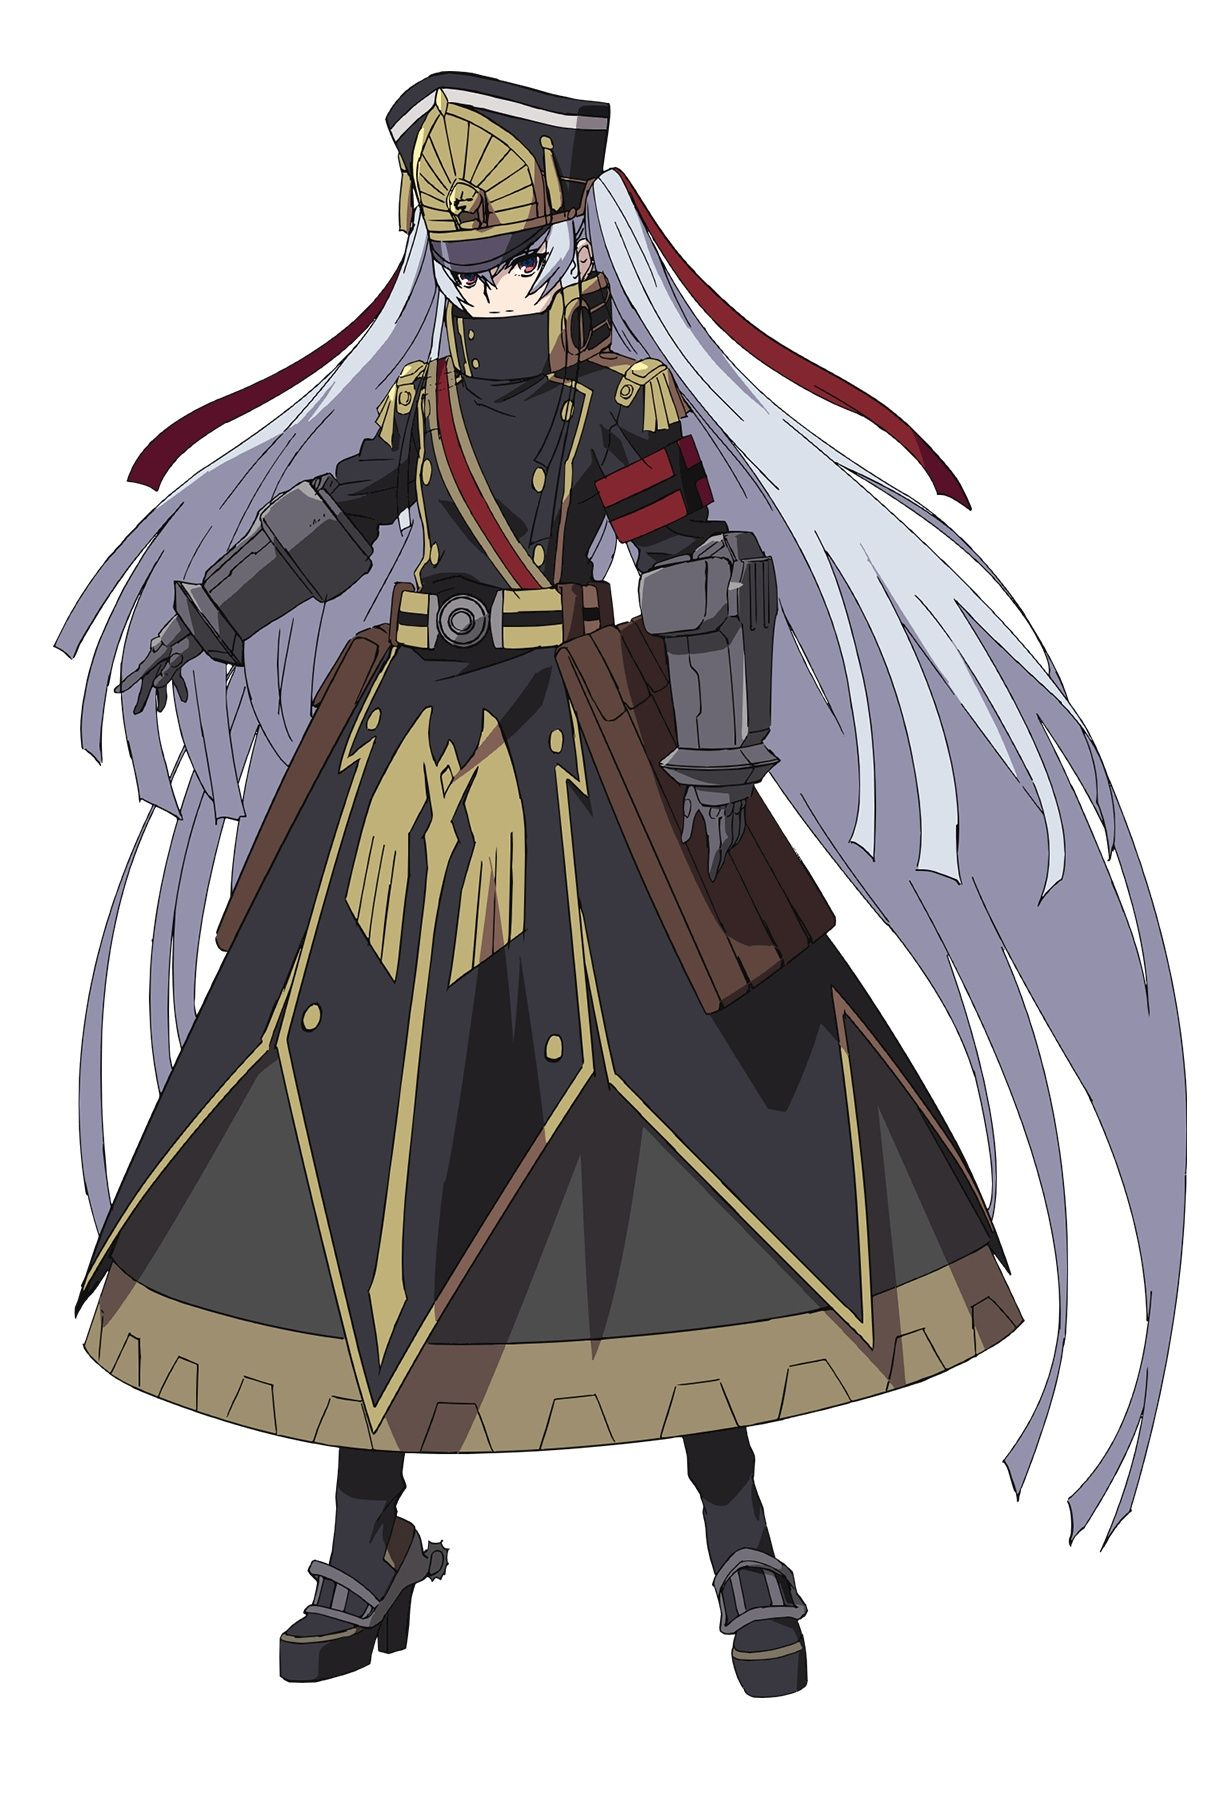 The Princess of Military Uniform / ReCREATORS History